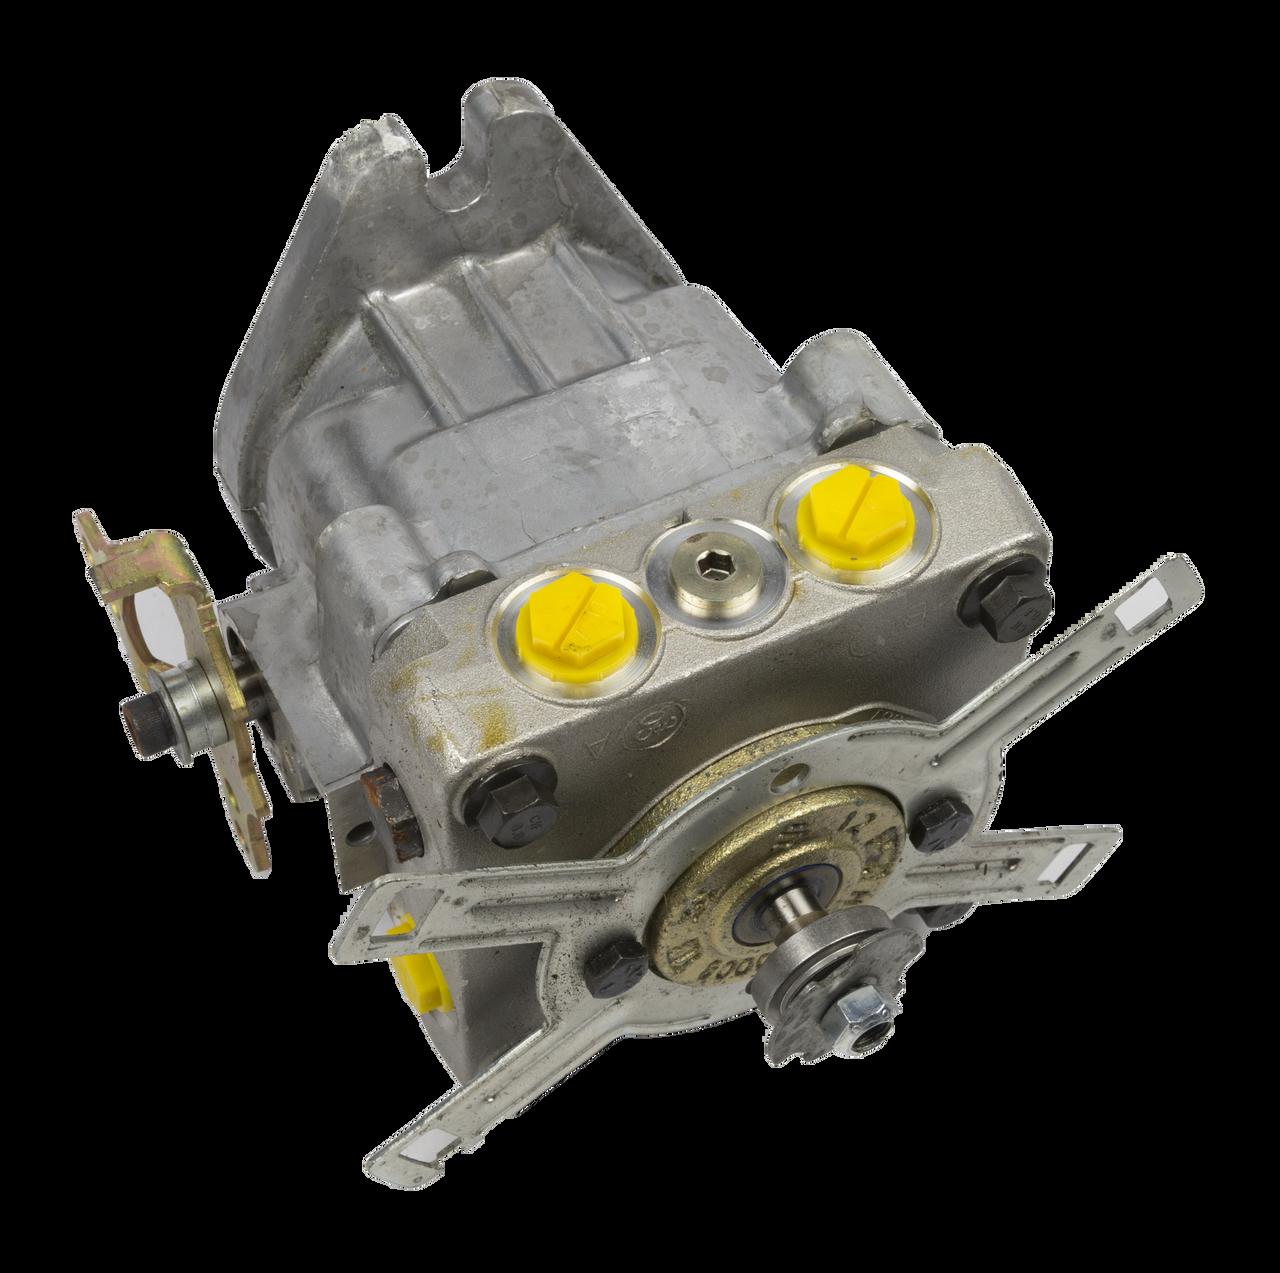 Spare Parts - Husqvarna Spare Parts - Zero Turn Spares